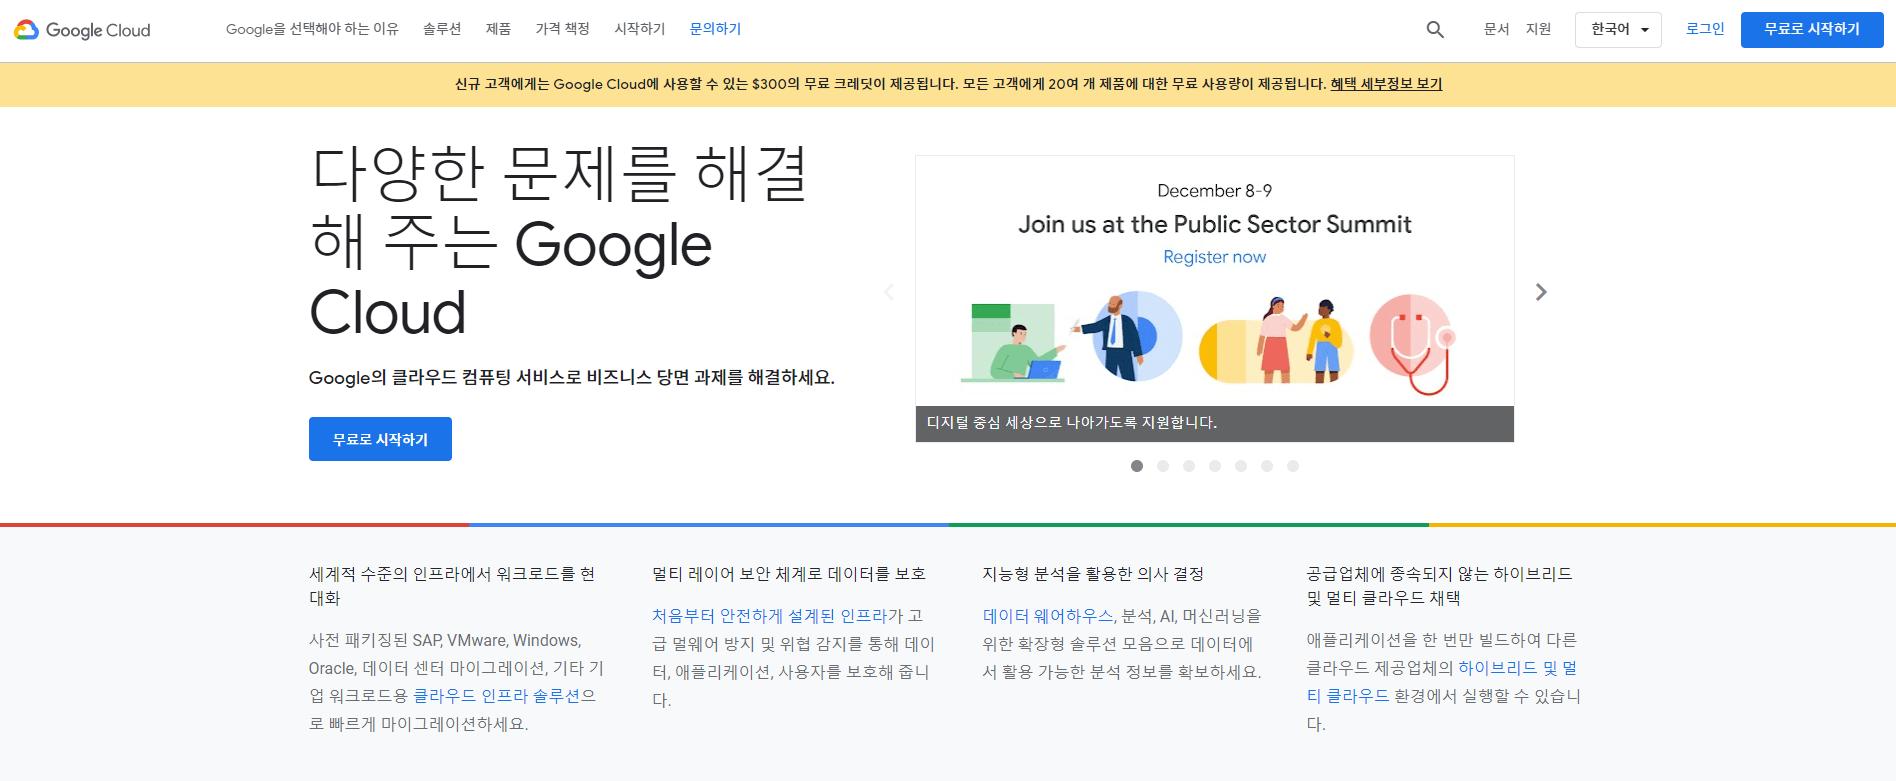 GoogleCloud_ko 1